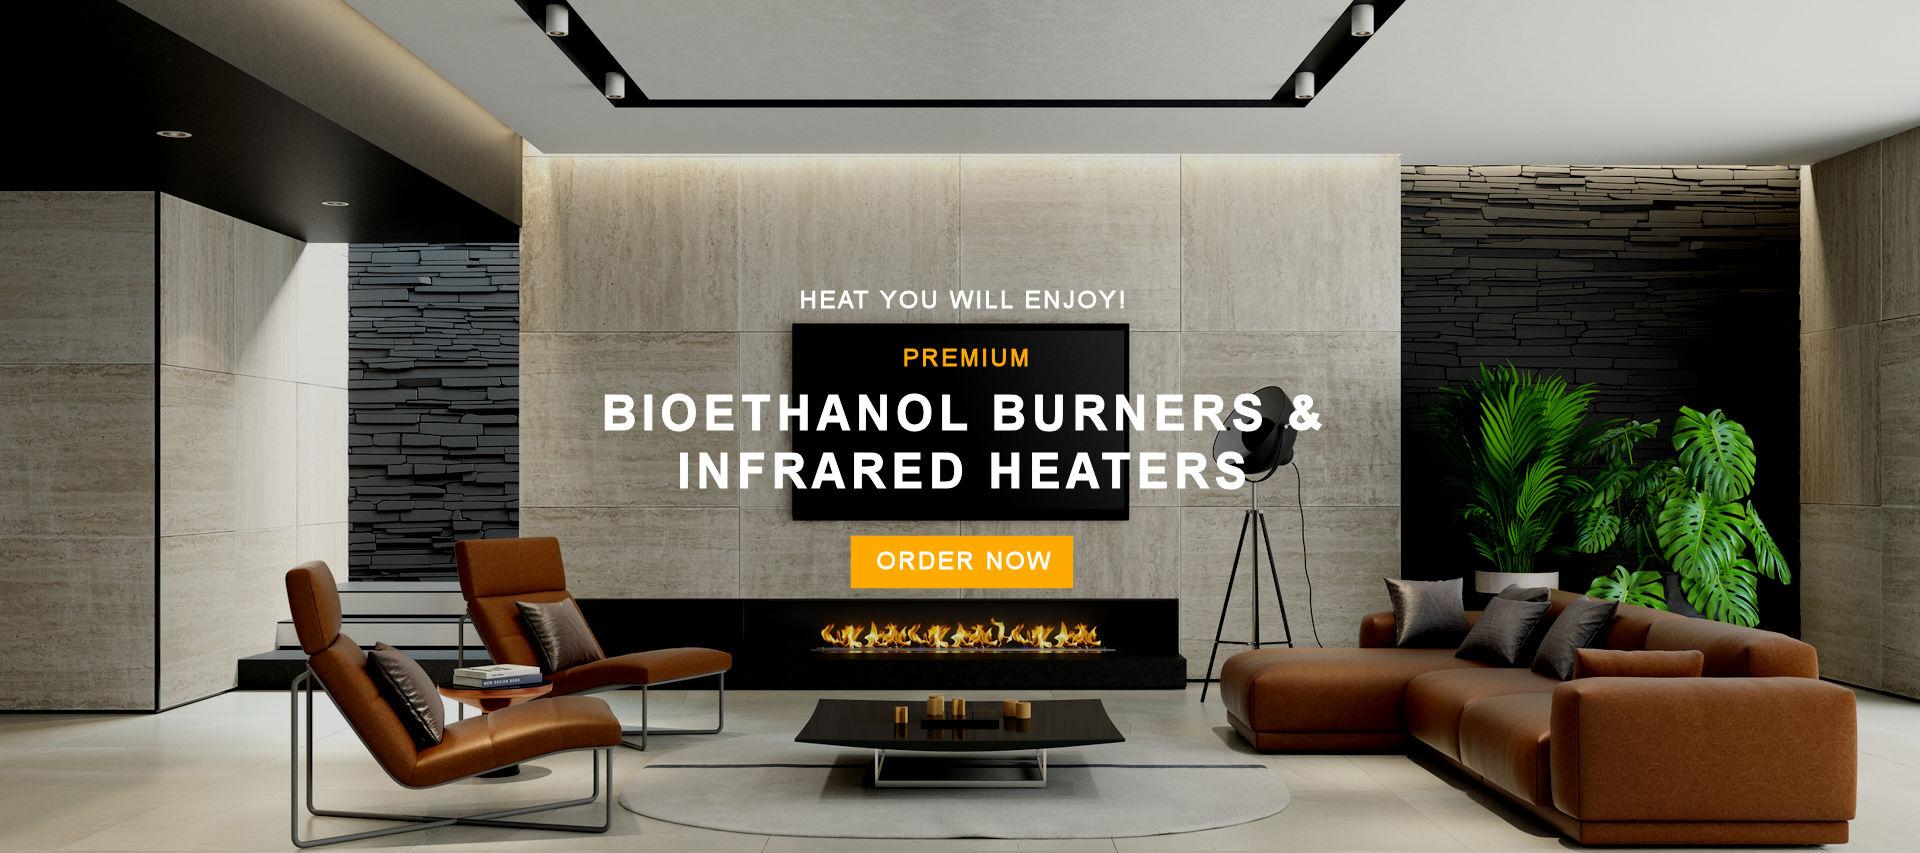 Premium bioethanol burners & infrared heaters